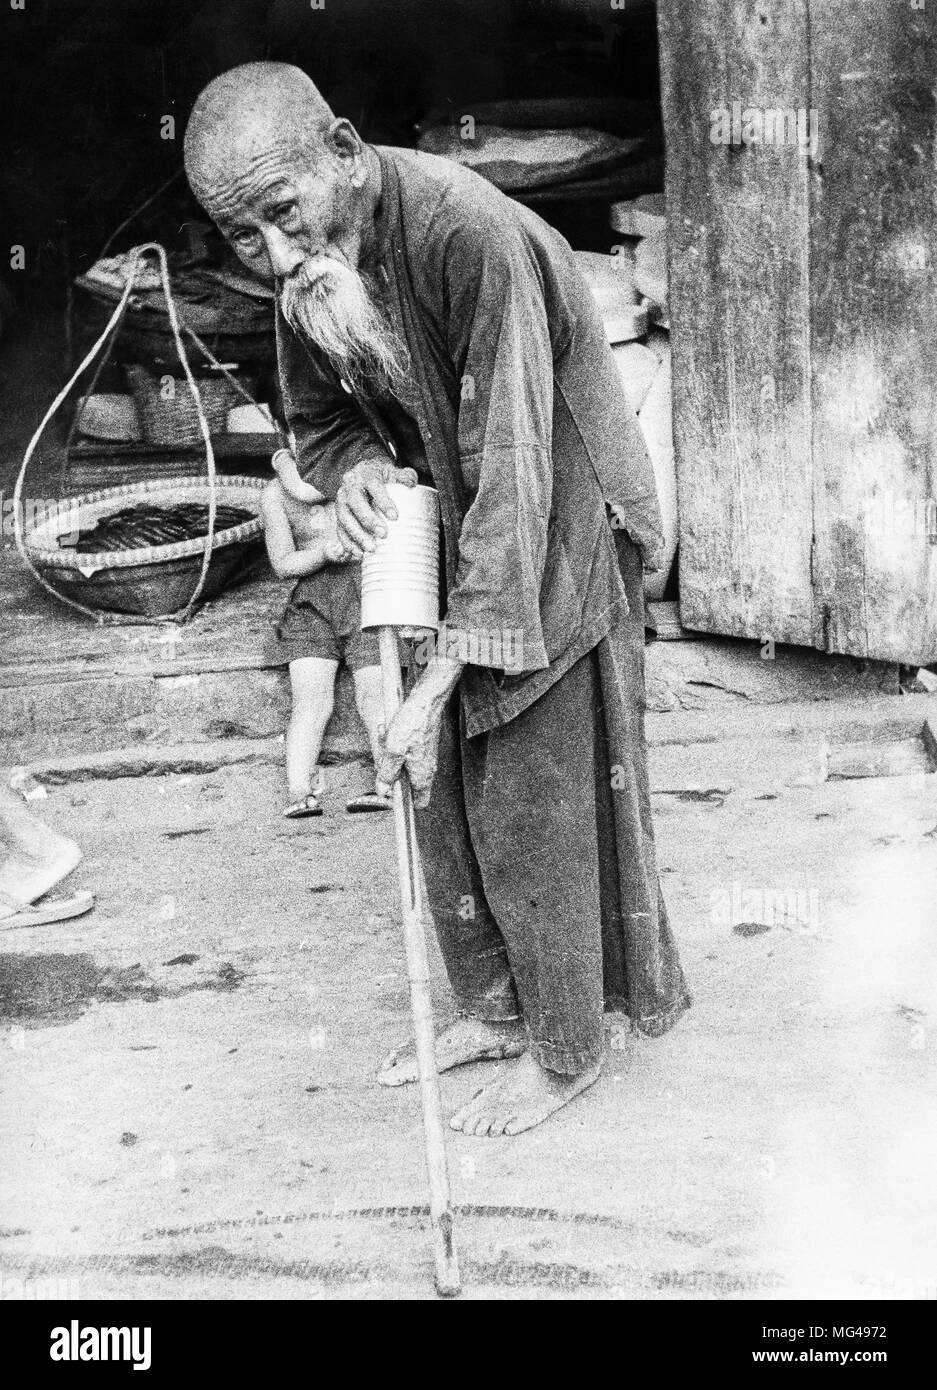 Chinese man, bangkok, thailand, 70s - Stock Image